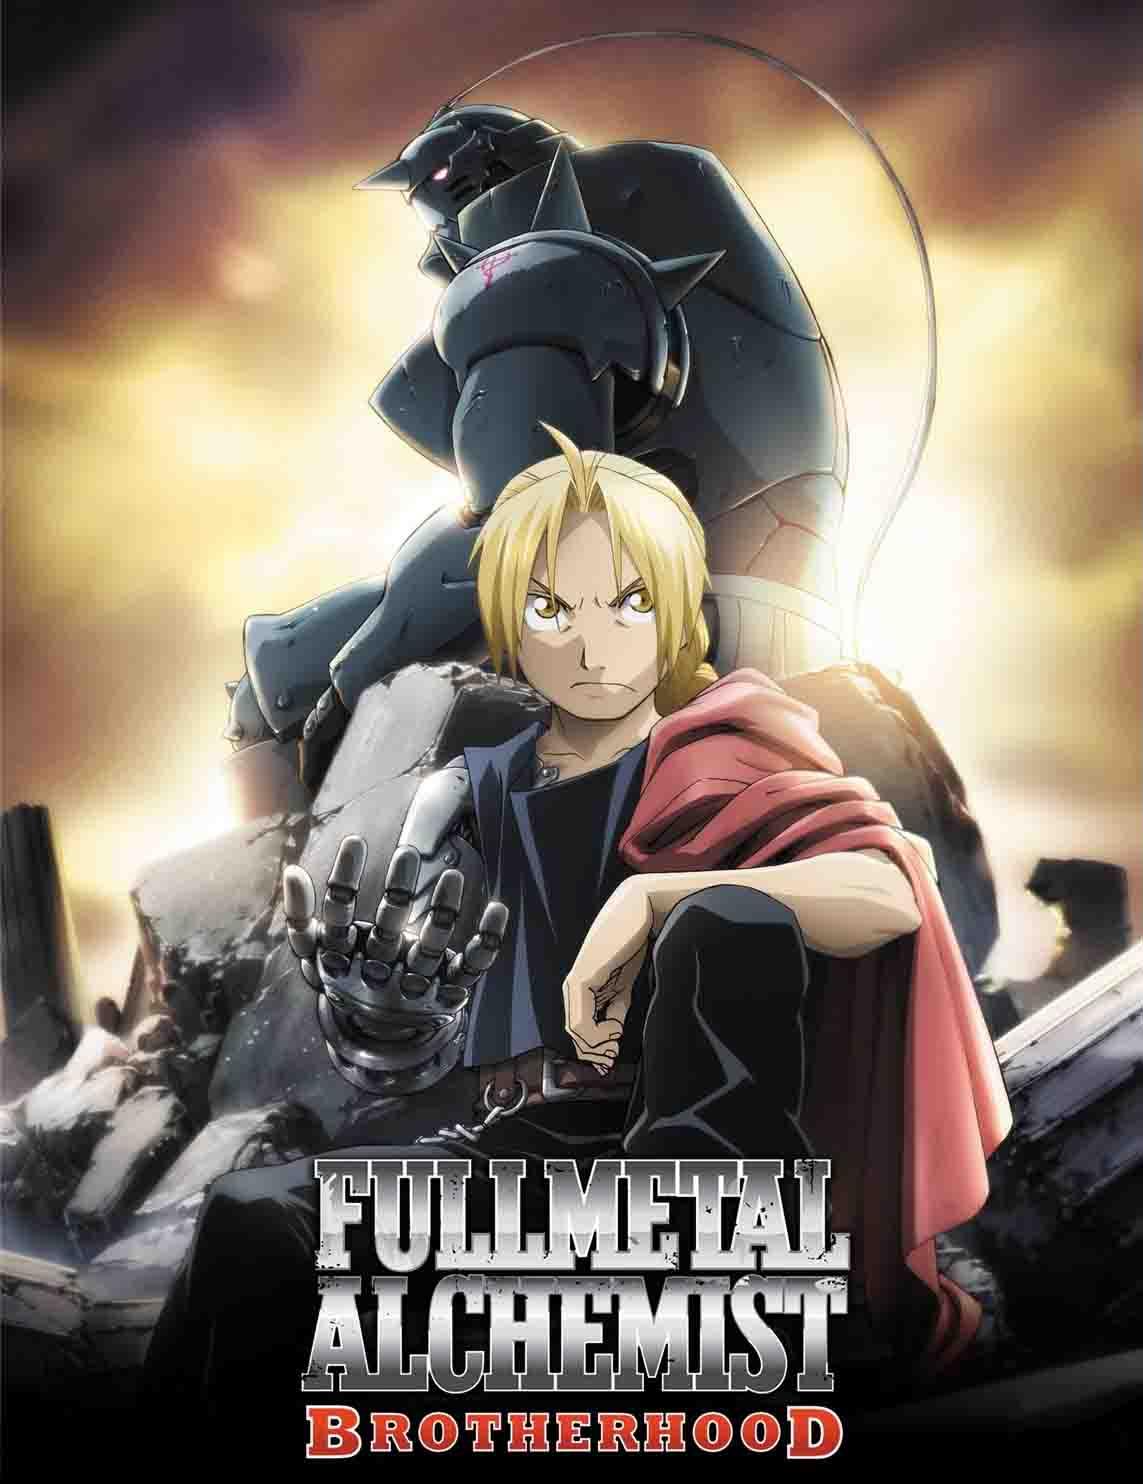 Fullmetal Alchemist: Brotherhood Torrent - WEB-DL 720p Dual Áudio (2009-2010)